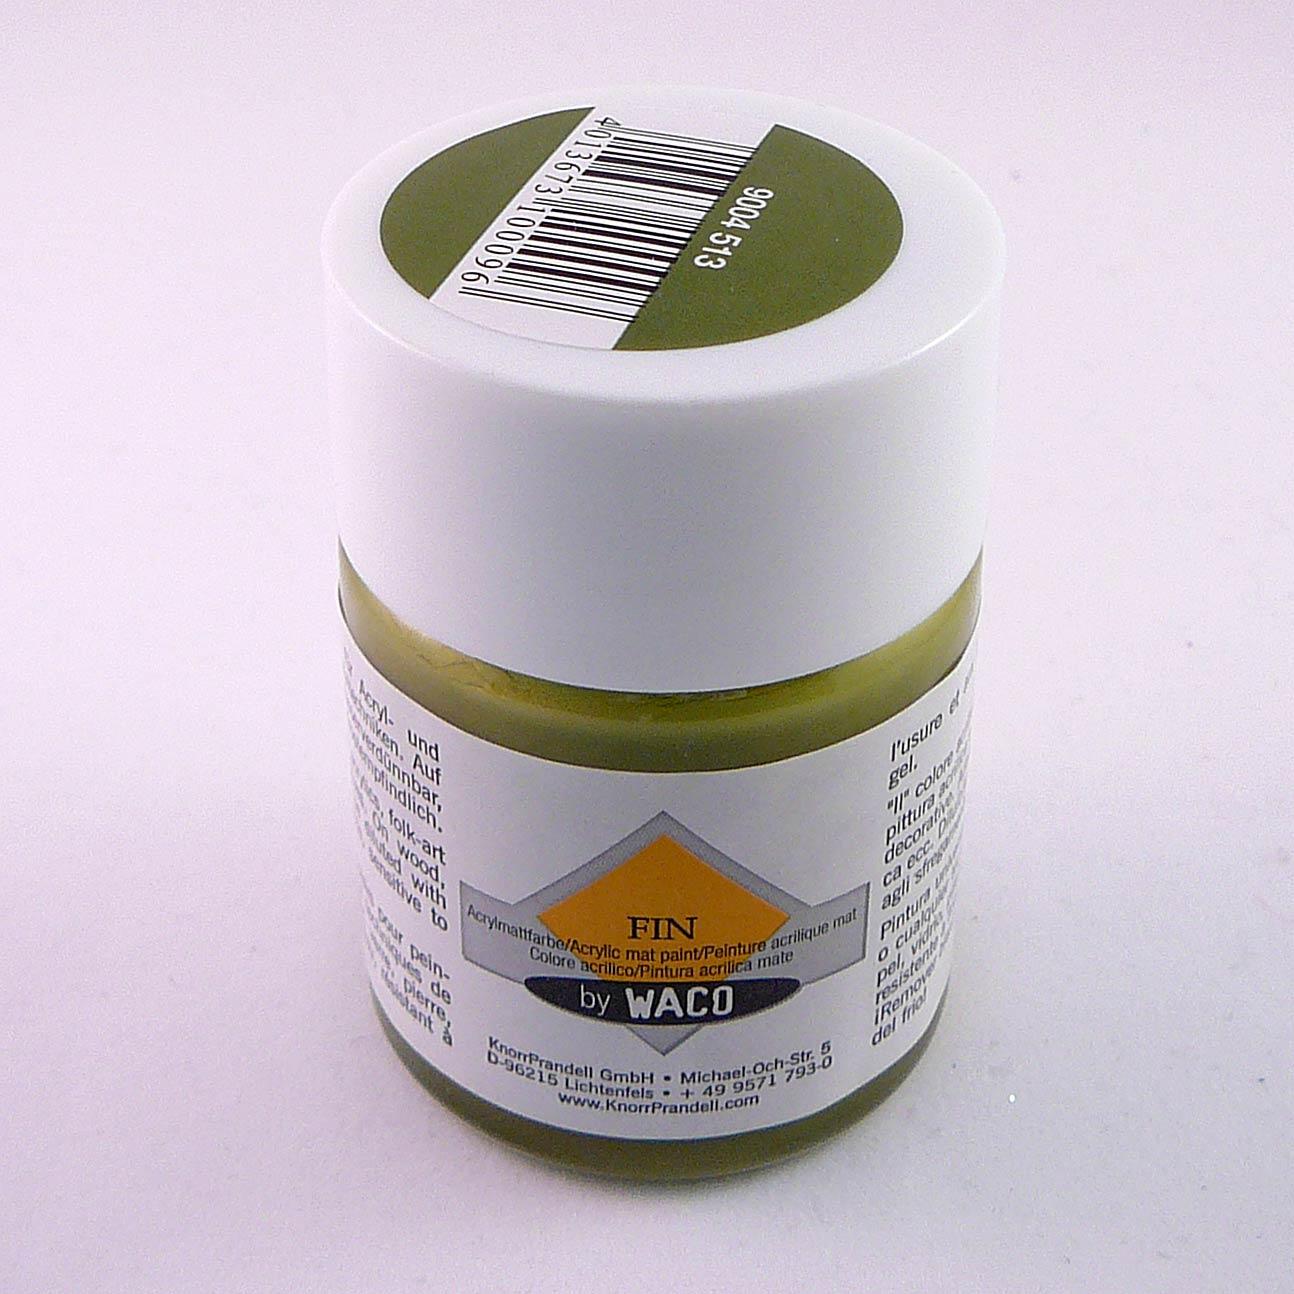 WACO Fin Farbe-Grün ( Reseda)